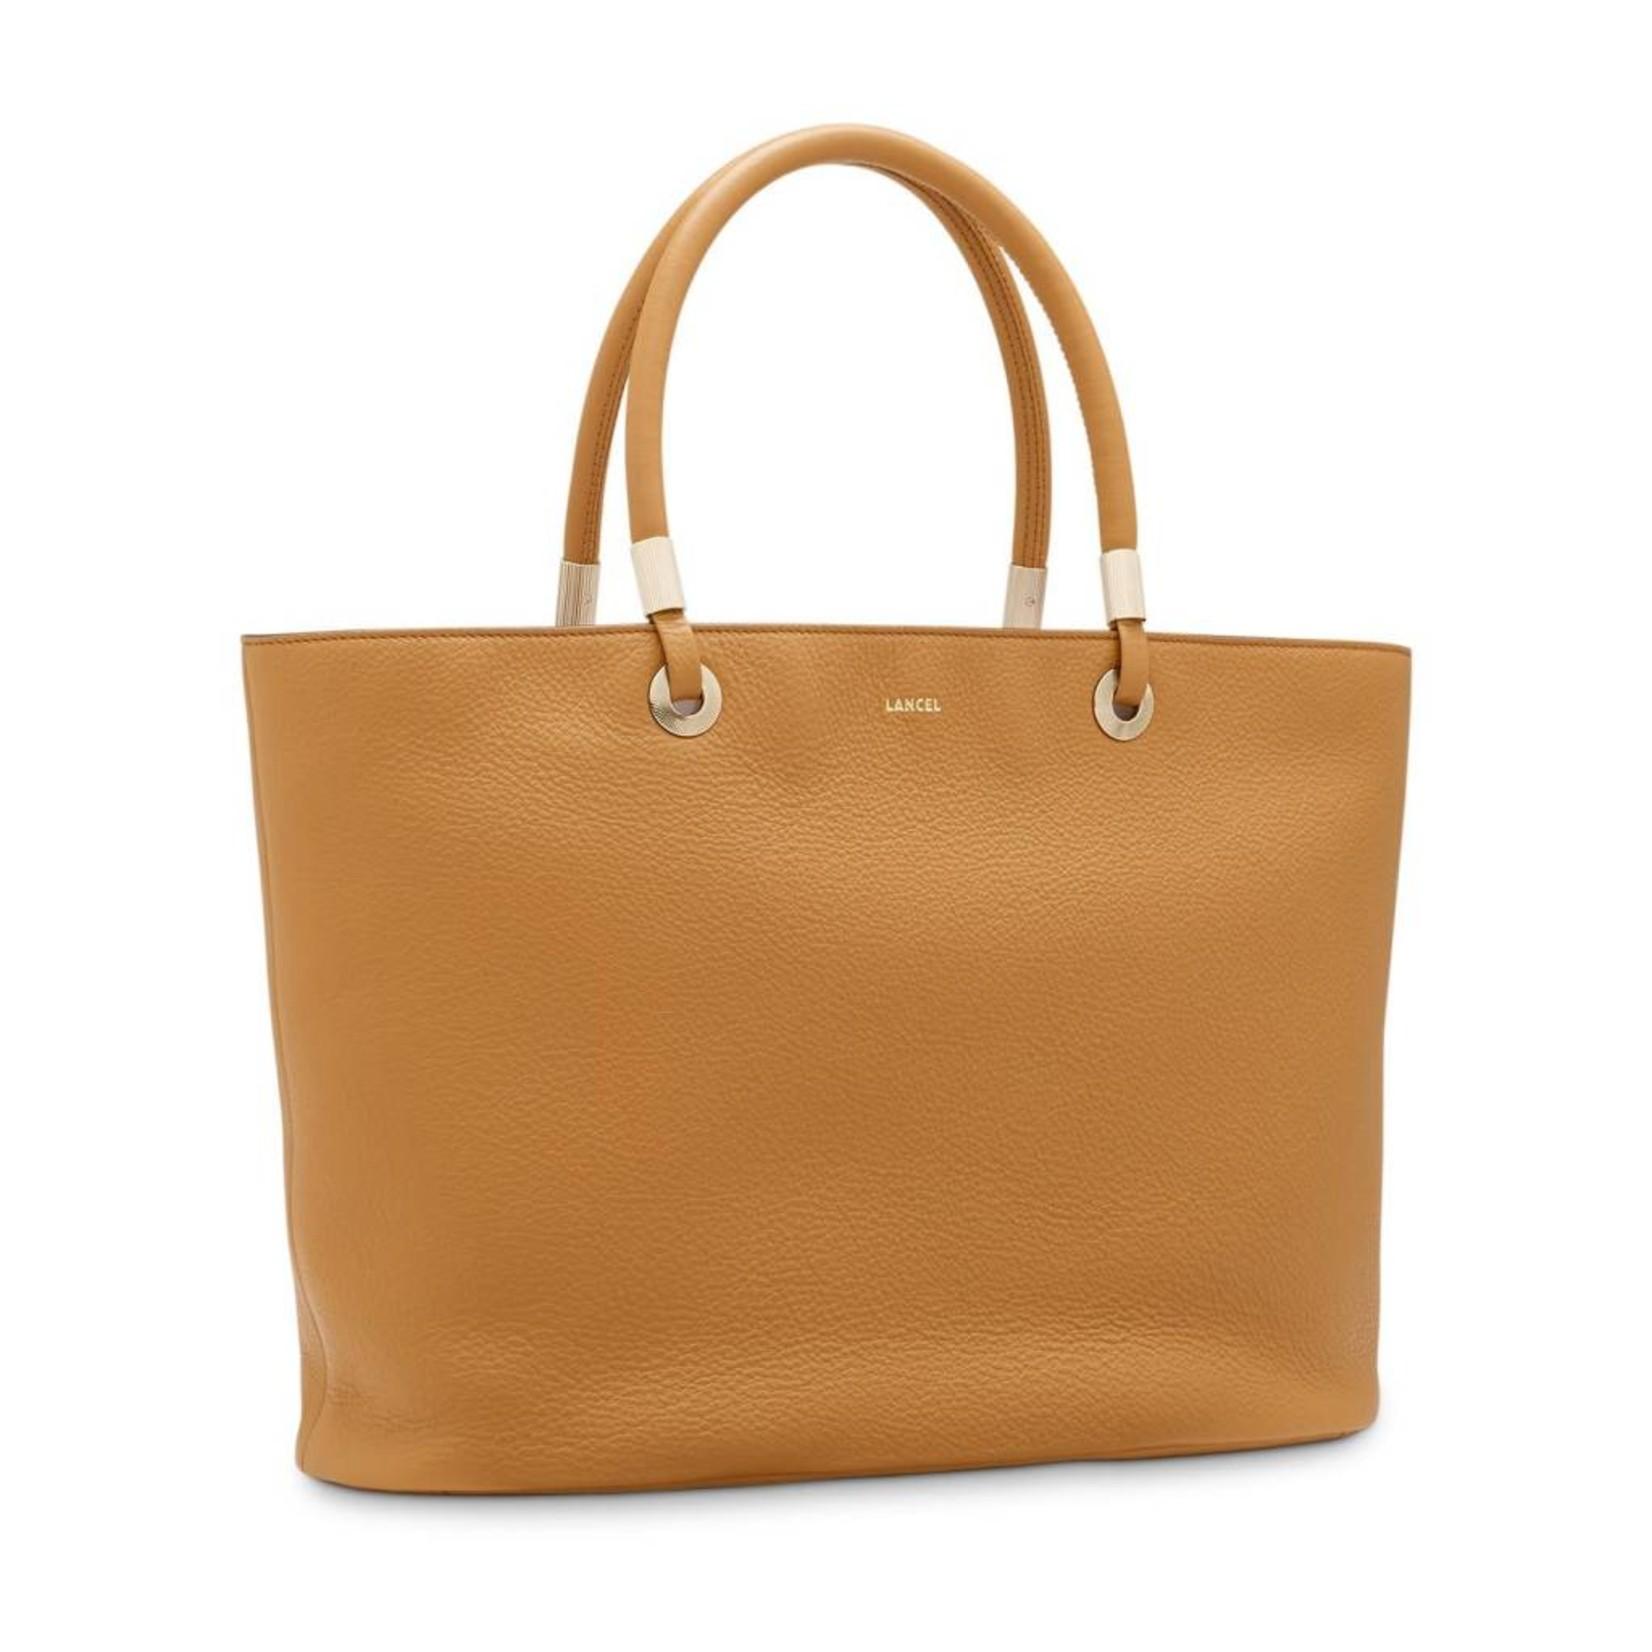 LANCEL Lancel - Women's Handbag - Flore